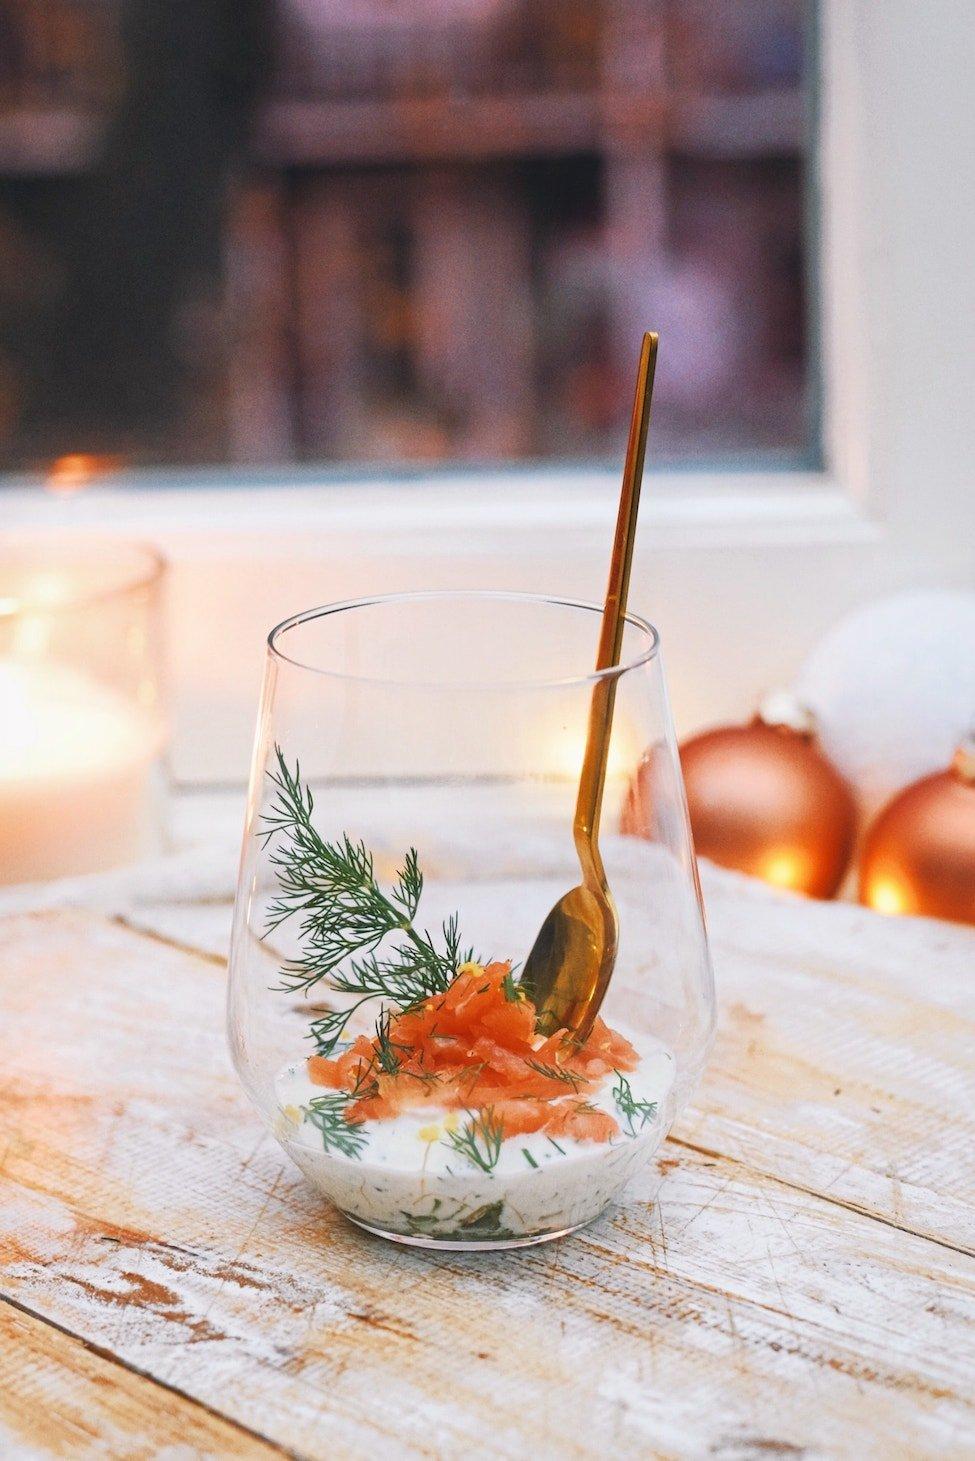 Dille zalm hapje | Kerst voorafje | Kerstmenu 2018 van Healthy Wanderlust